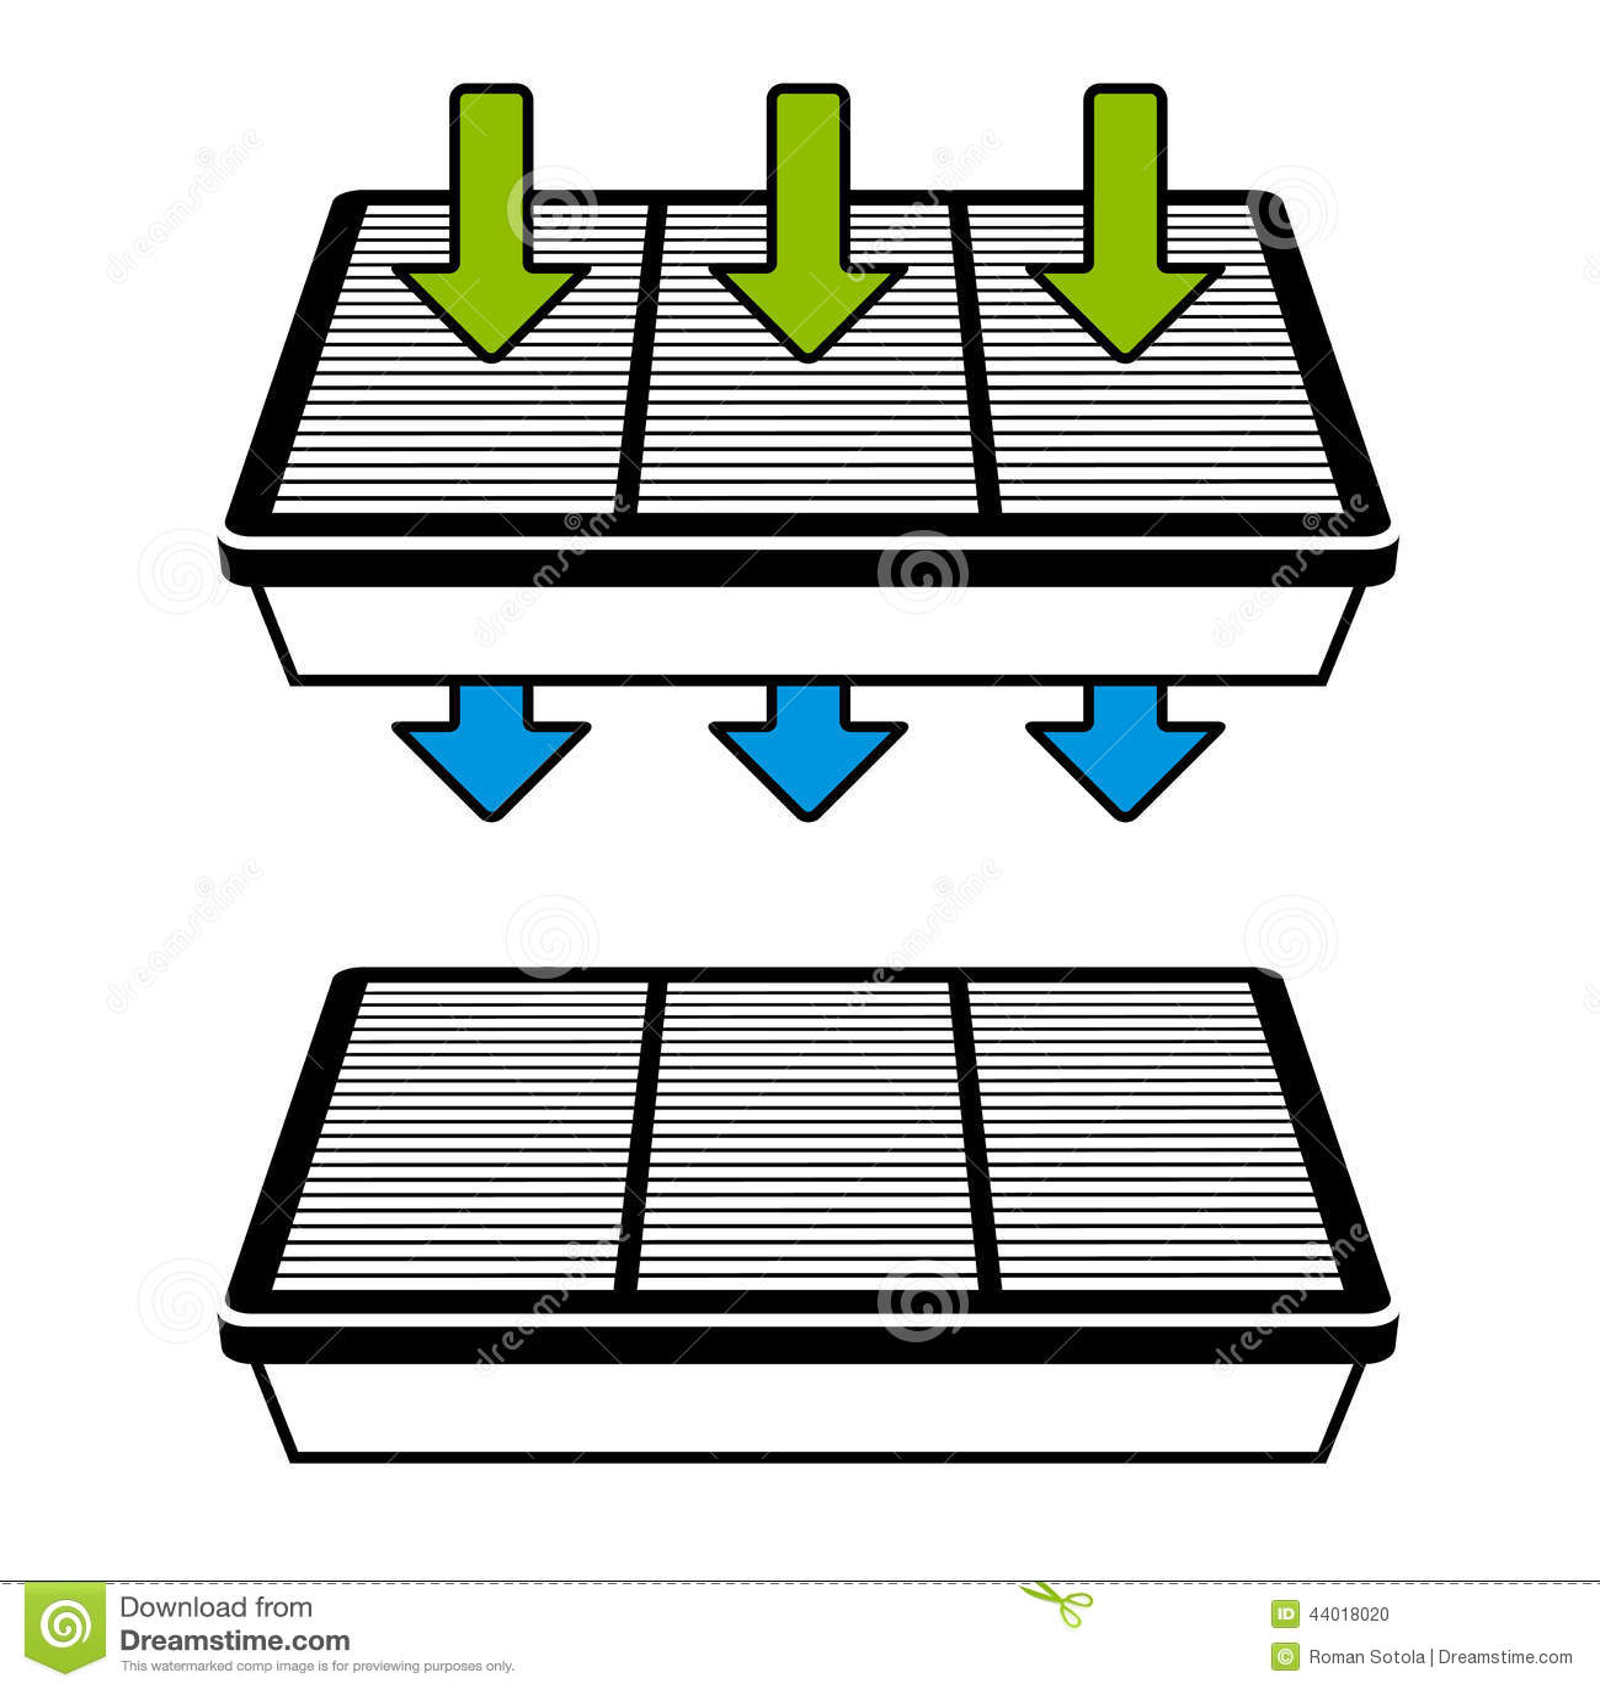 Air Filter Flow Symbols Stock Vector Illustration Of Cleaner 44018020